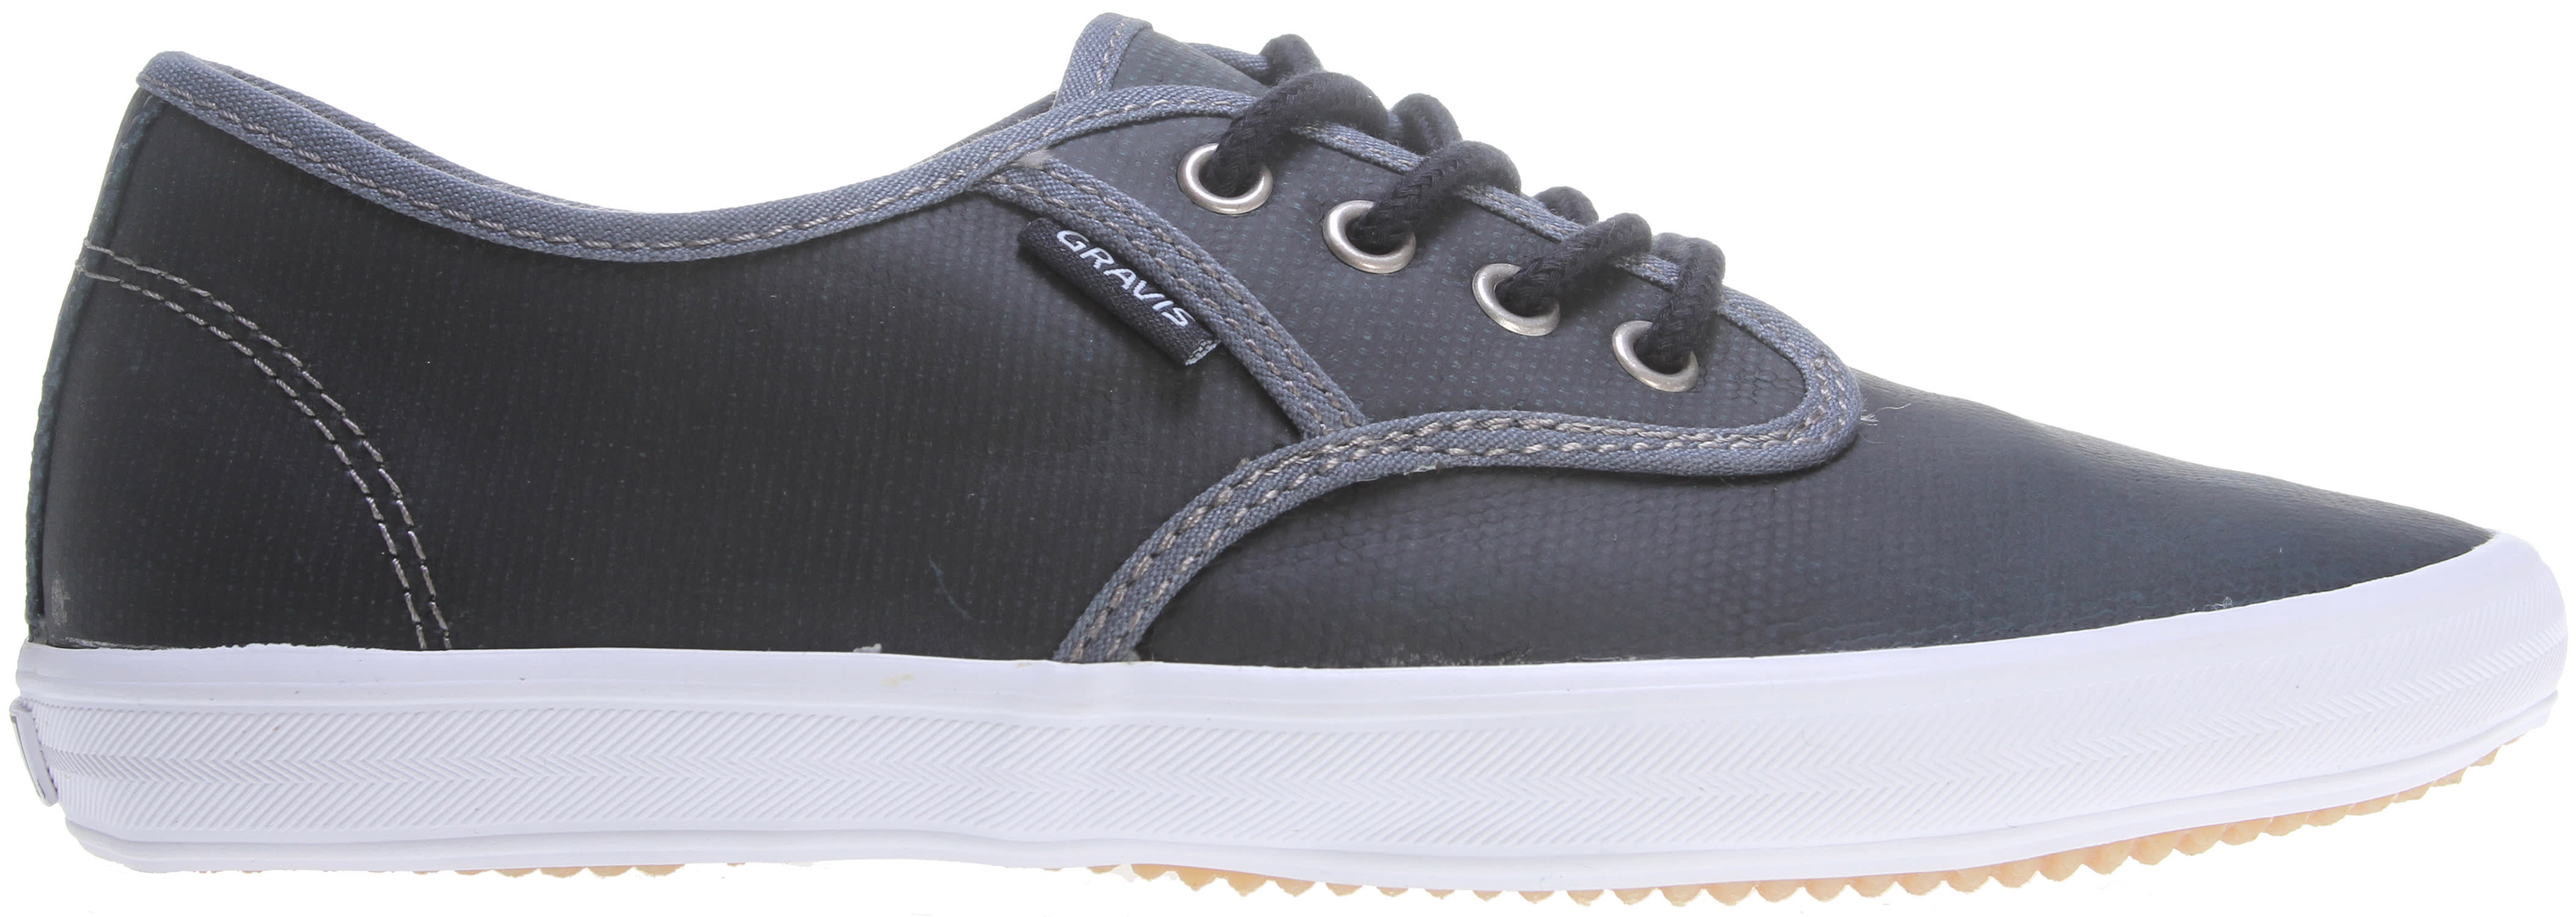 c5b42a842fe32f Gravis Slymz Wax Shoes Dark Navy Womens on PopScreen